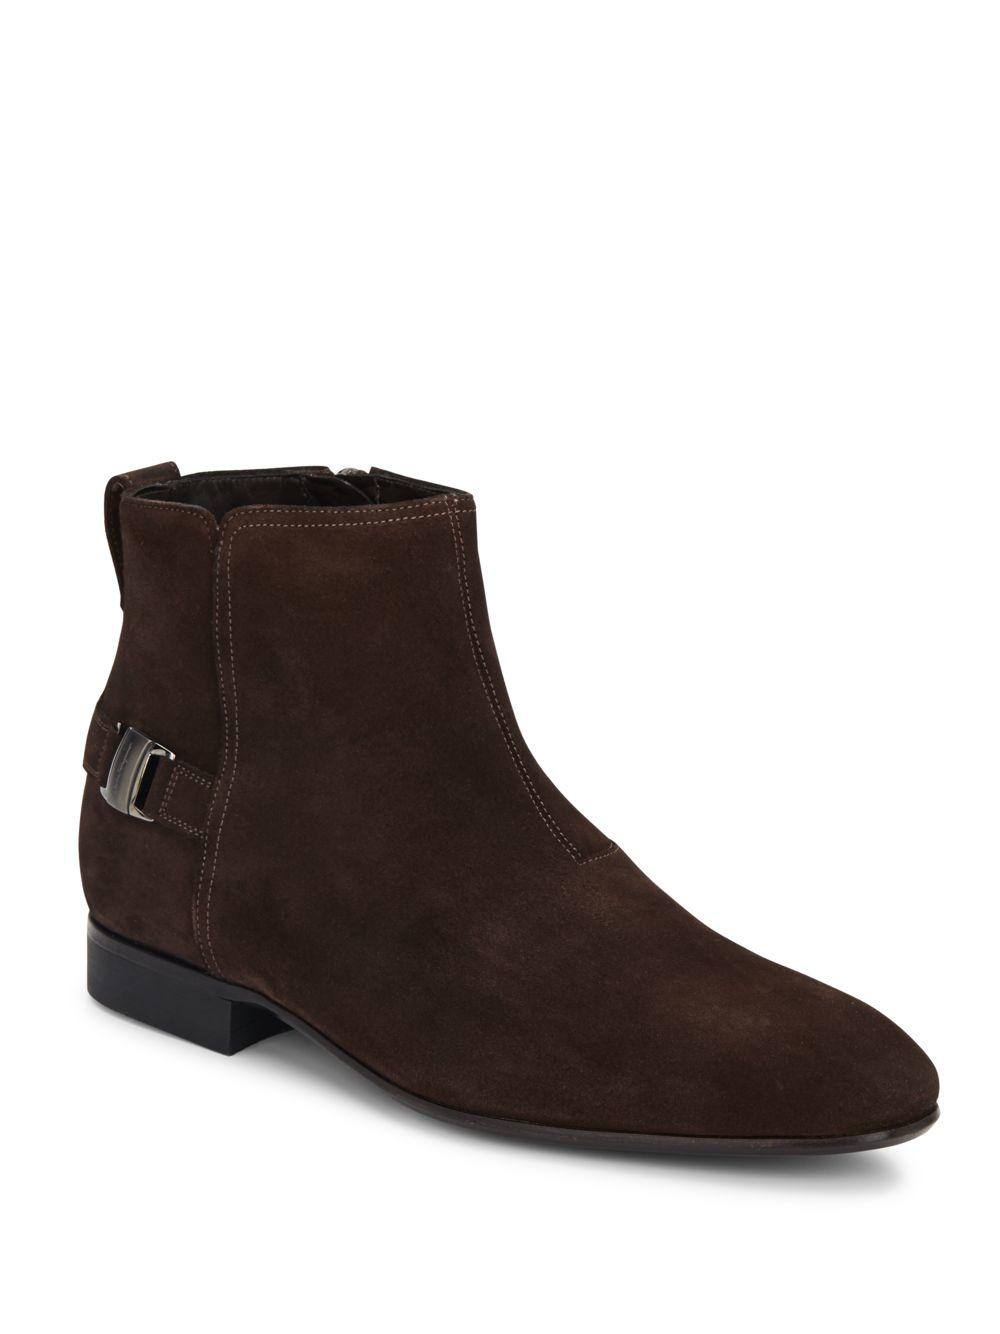 ferragamo suede buckle boots in brown lyst